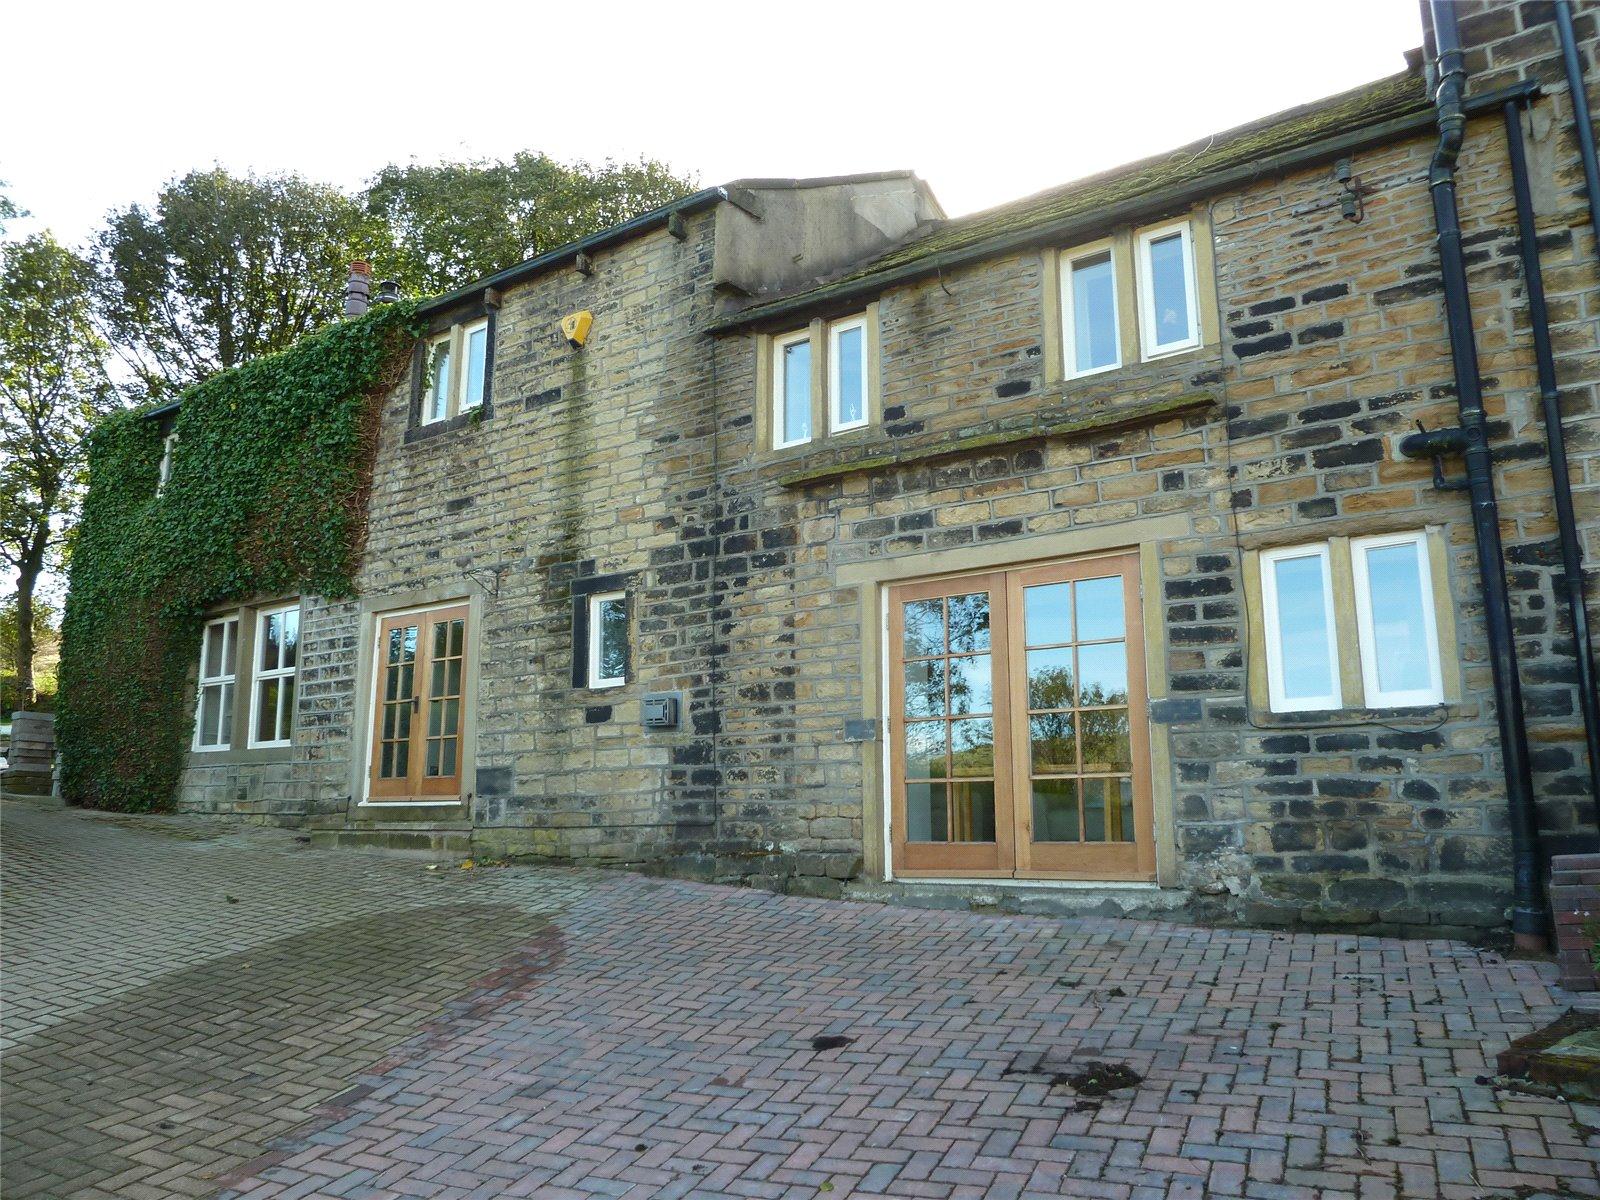 2 Bedrooms Terraced House for sale in Old Bank Bottom, Marsden, Huddersfield, HD7